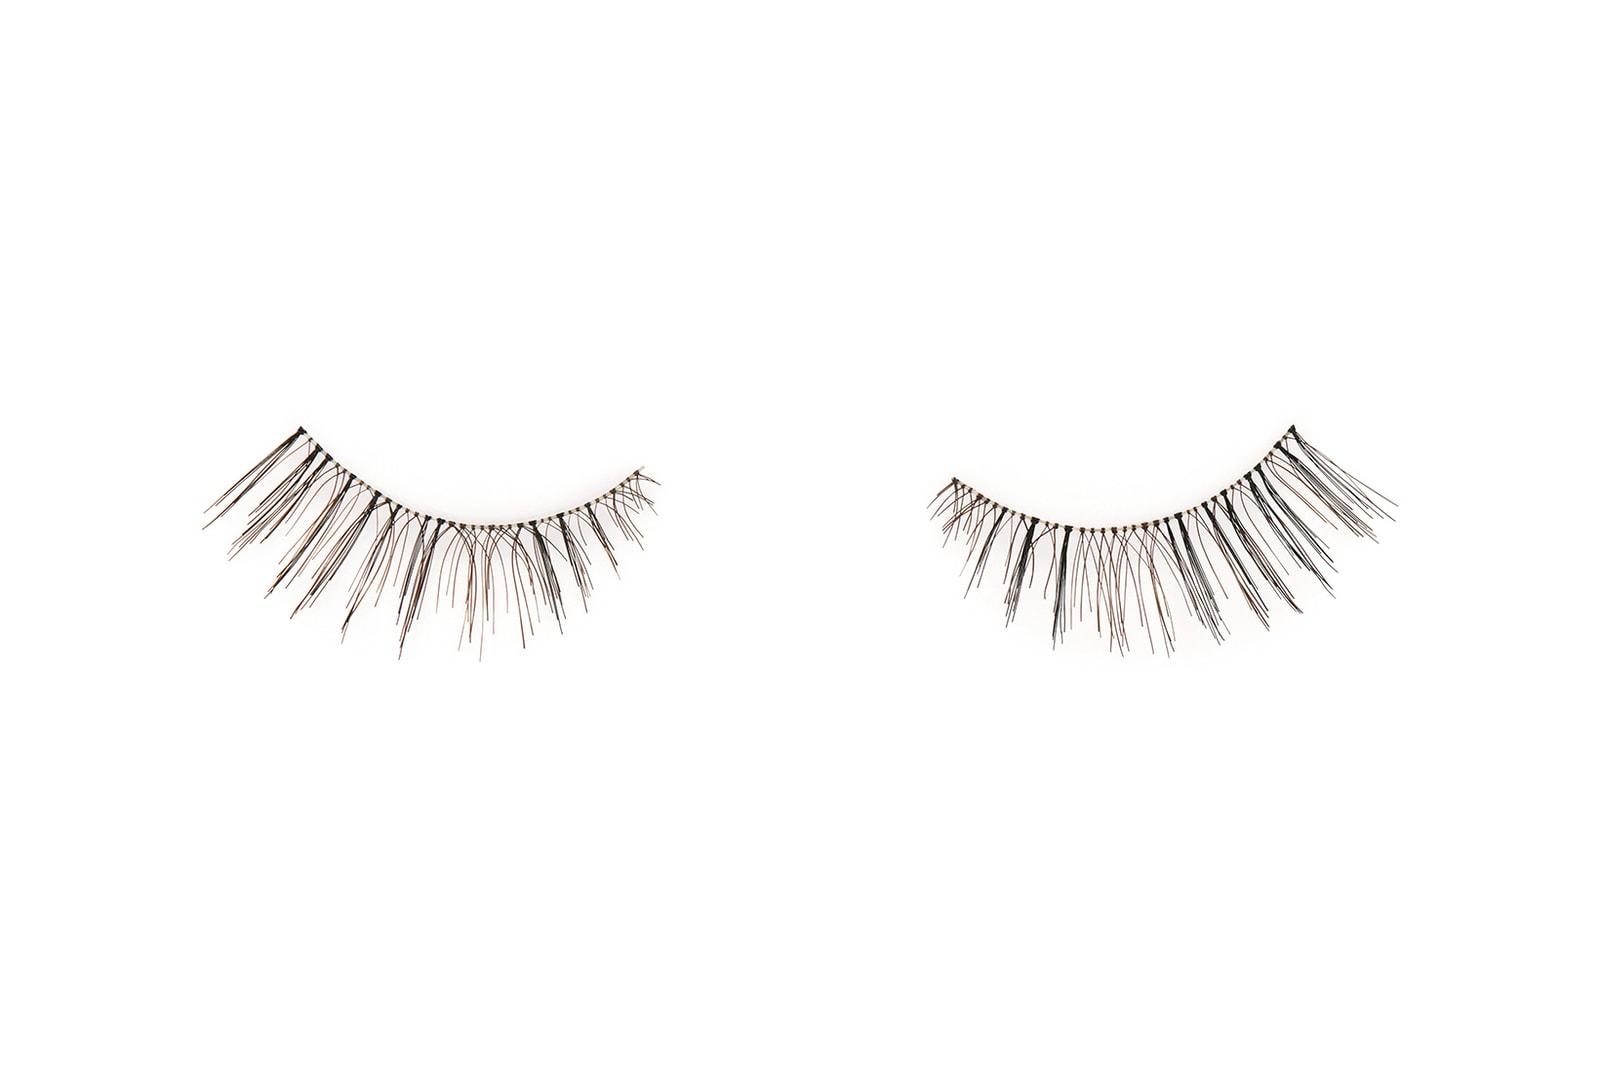 jenna lyons loveseen false fake falsies eyelashes troi ollivierre beauty brand launch